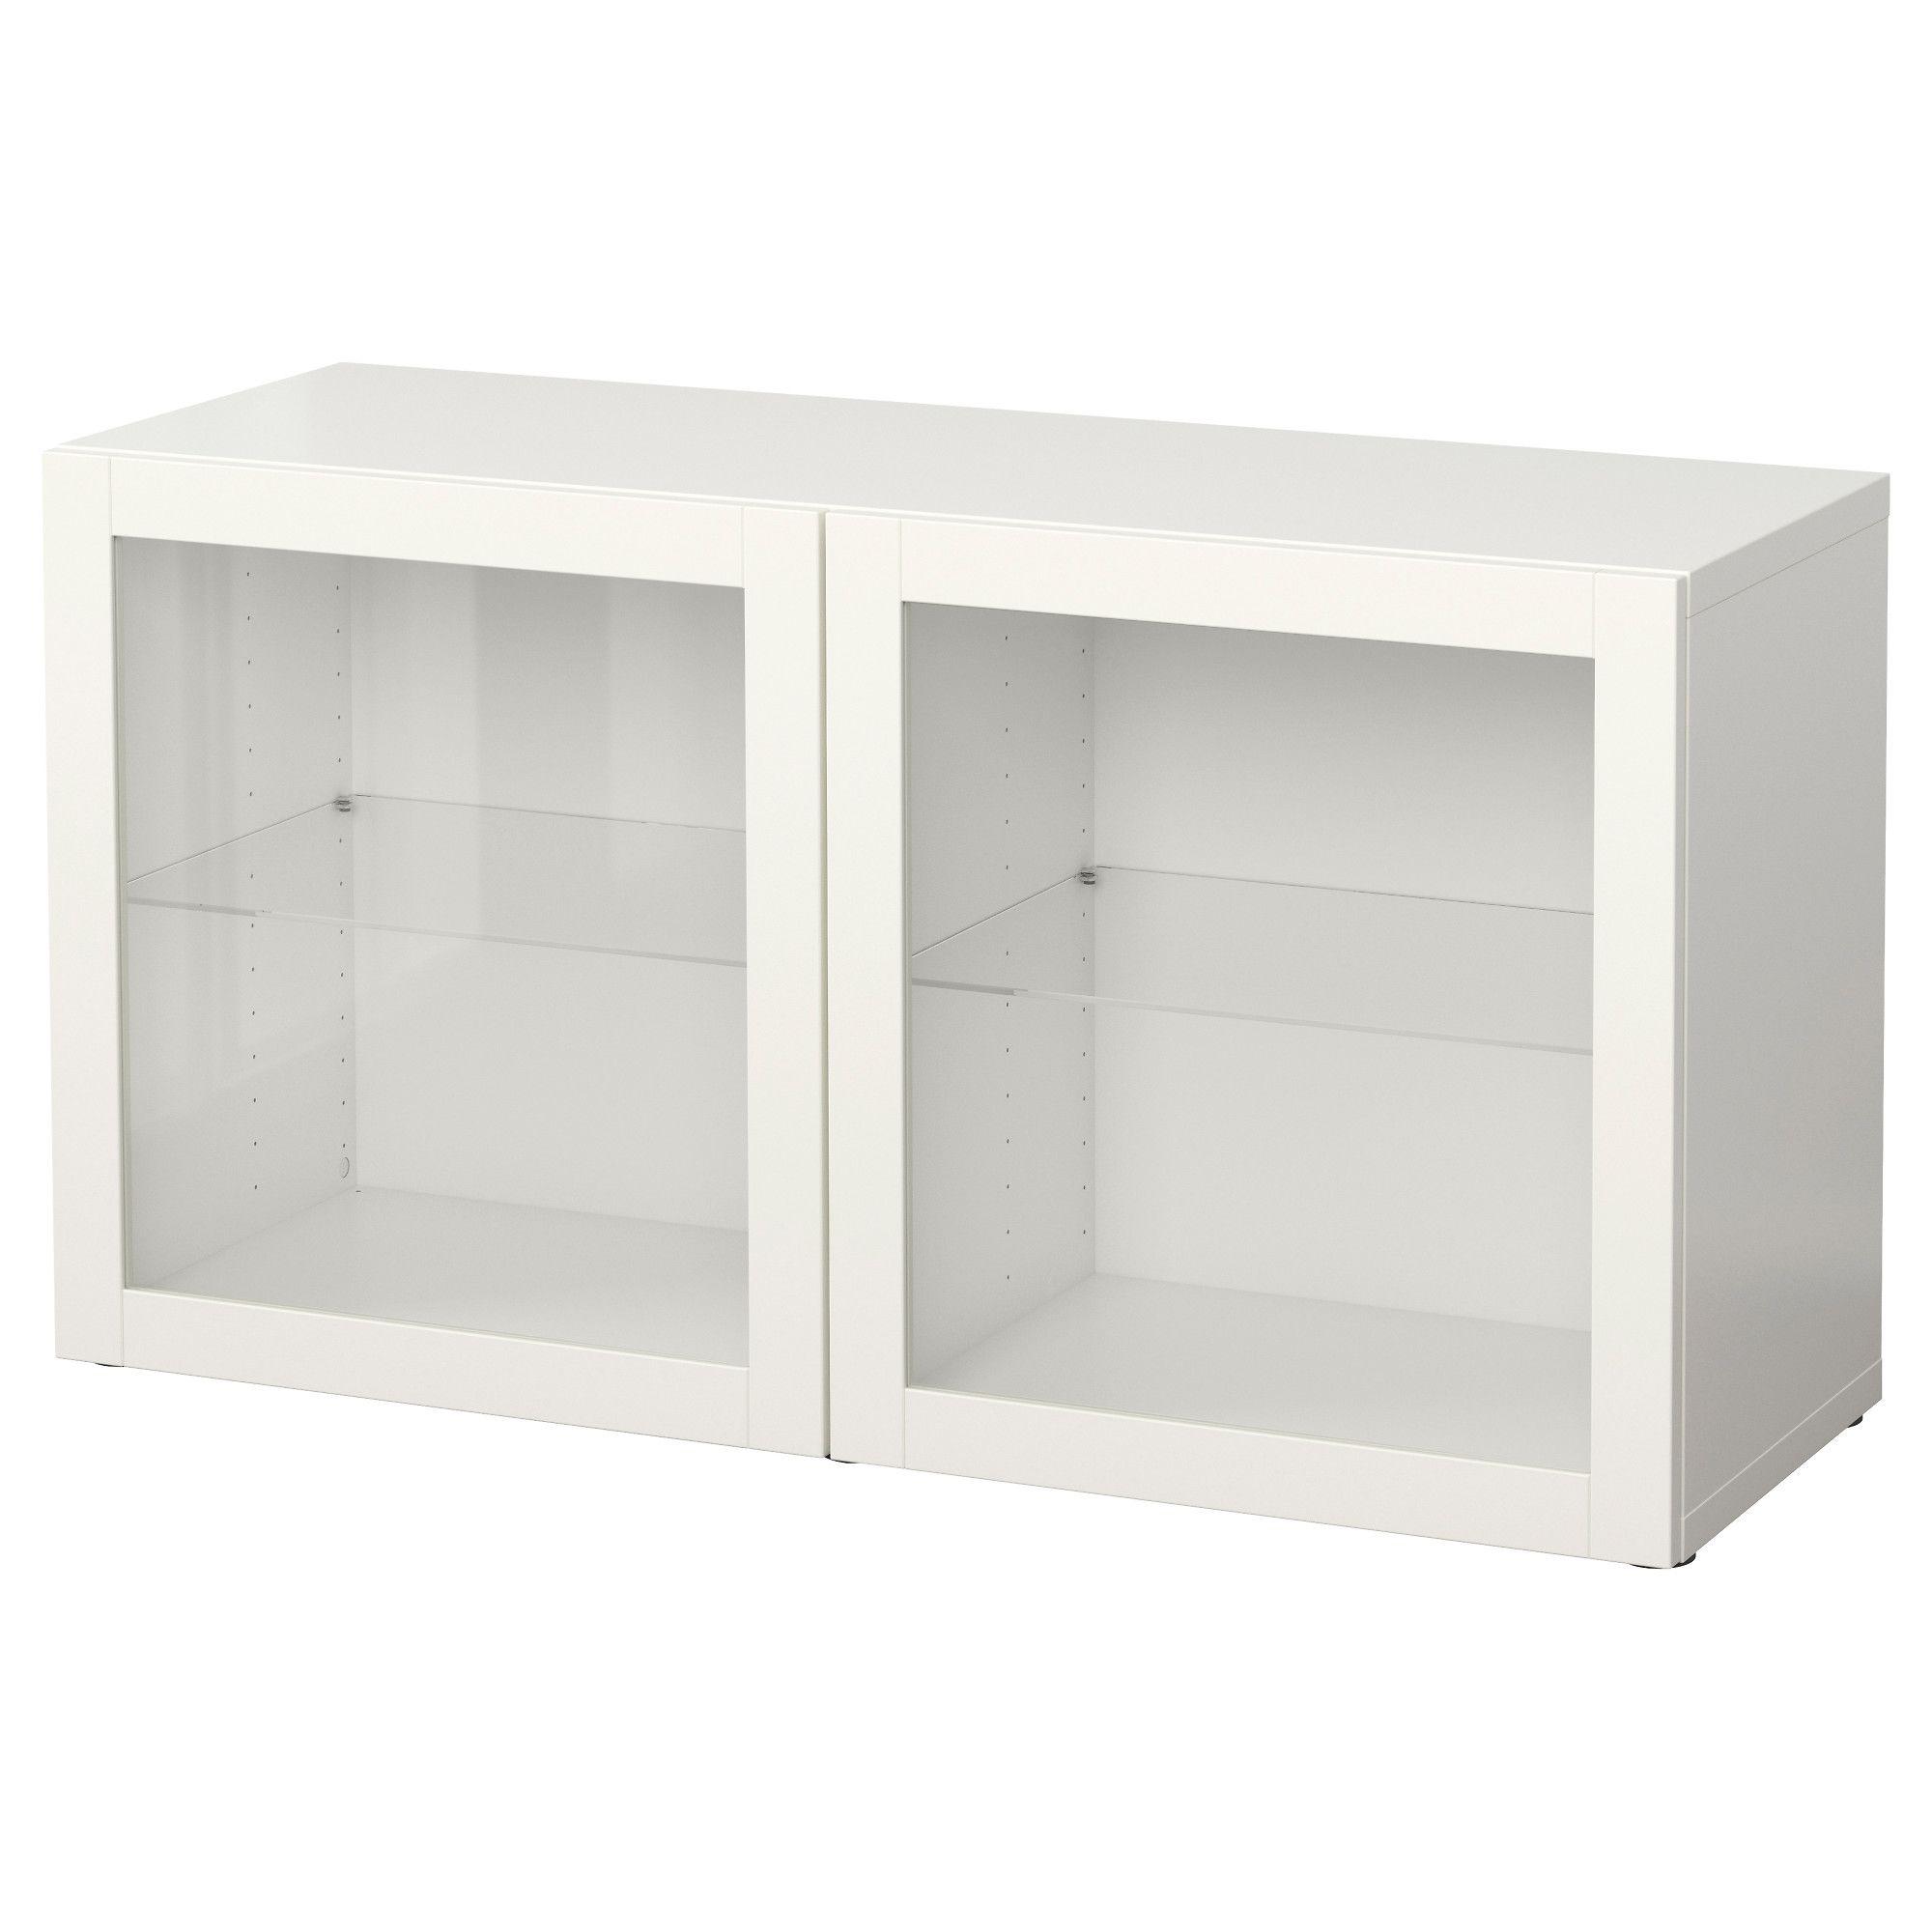 Besta Shelf Unit With Glass Doors Sindvik White 47 1 4x15 3 4x25